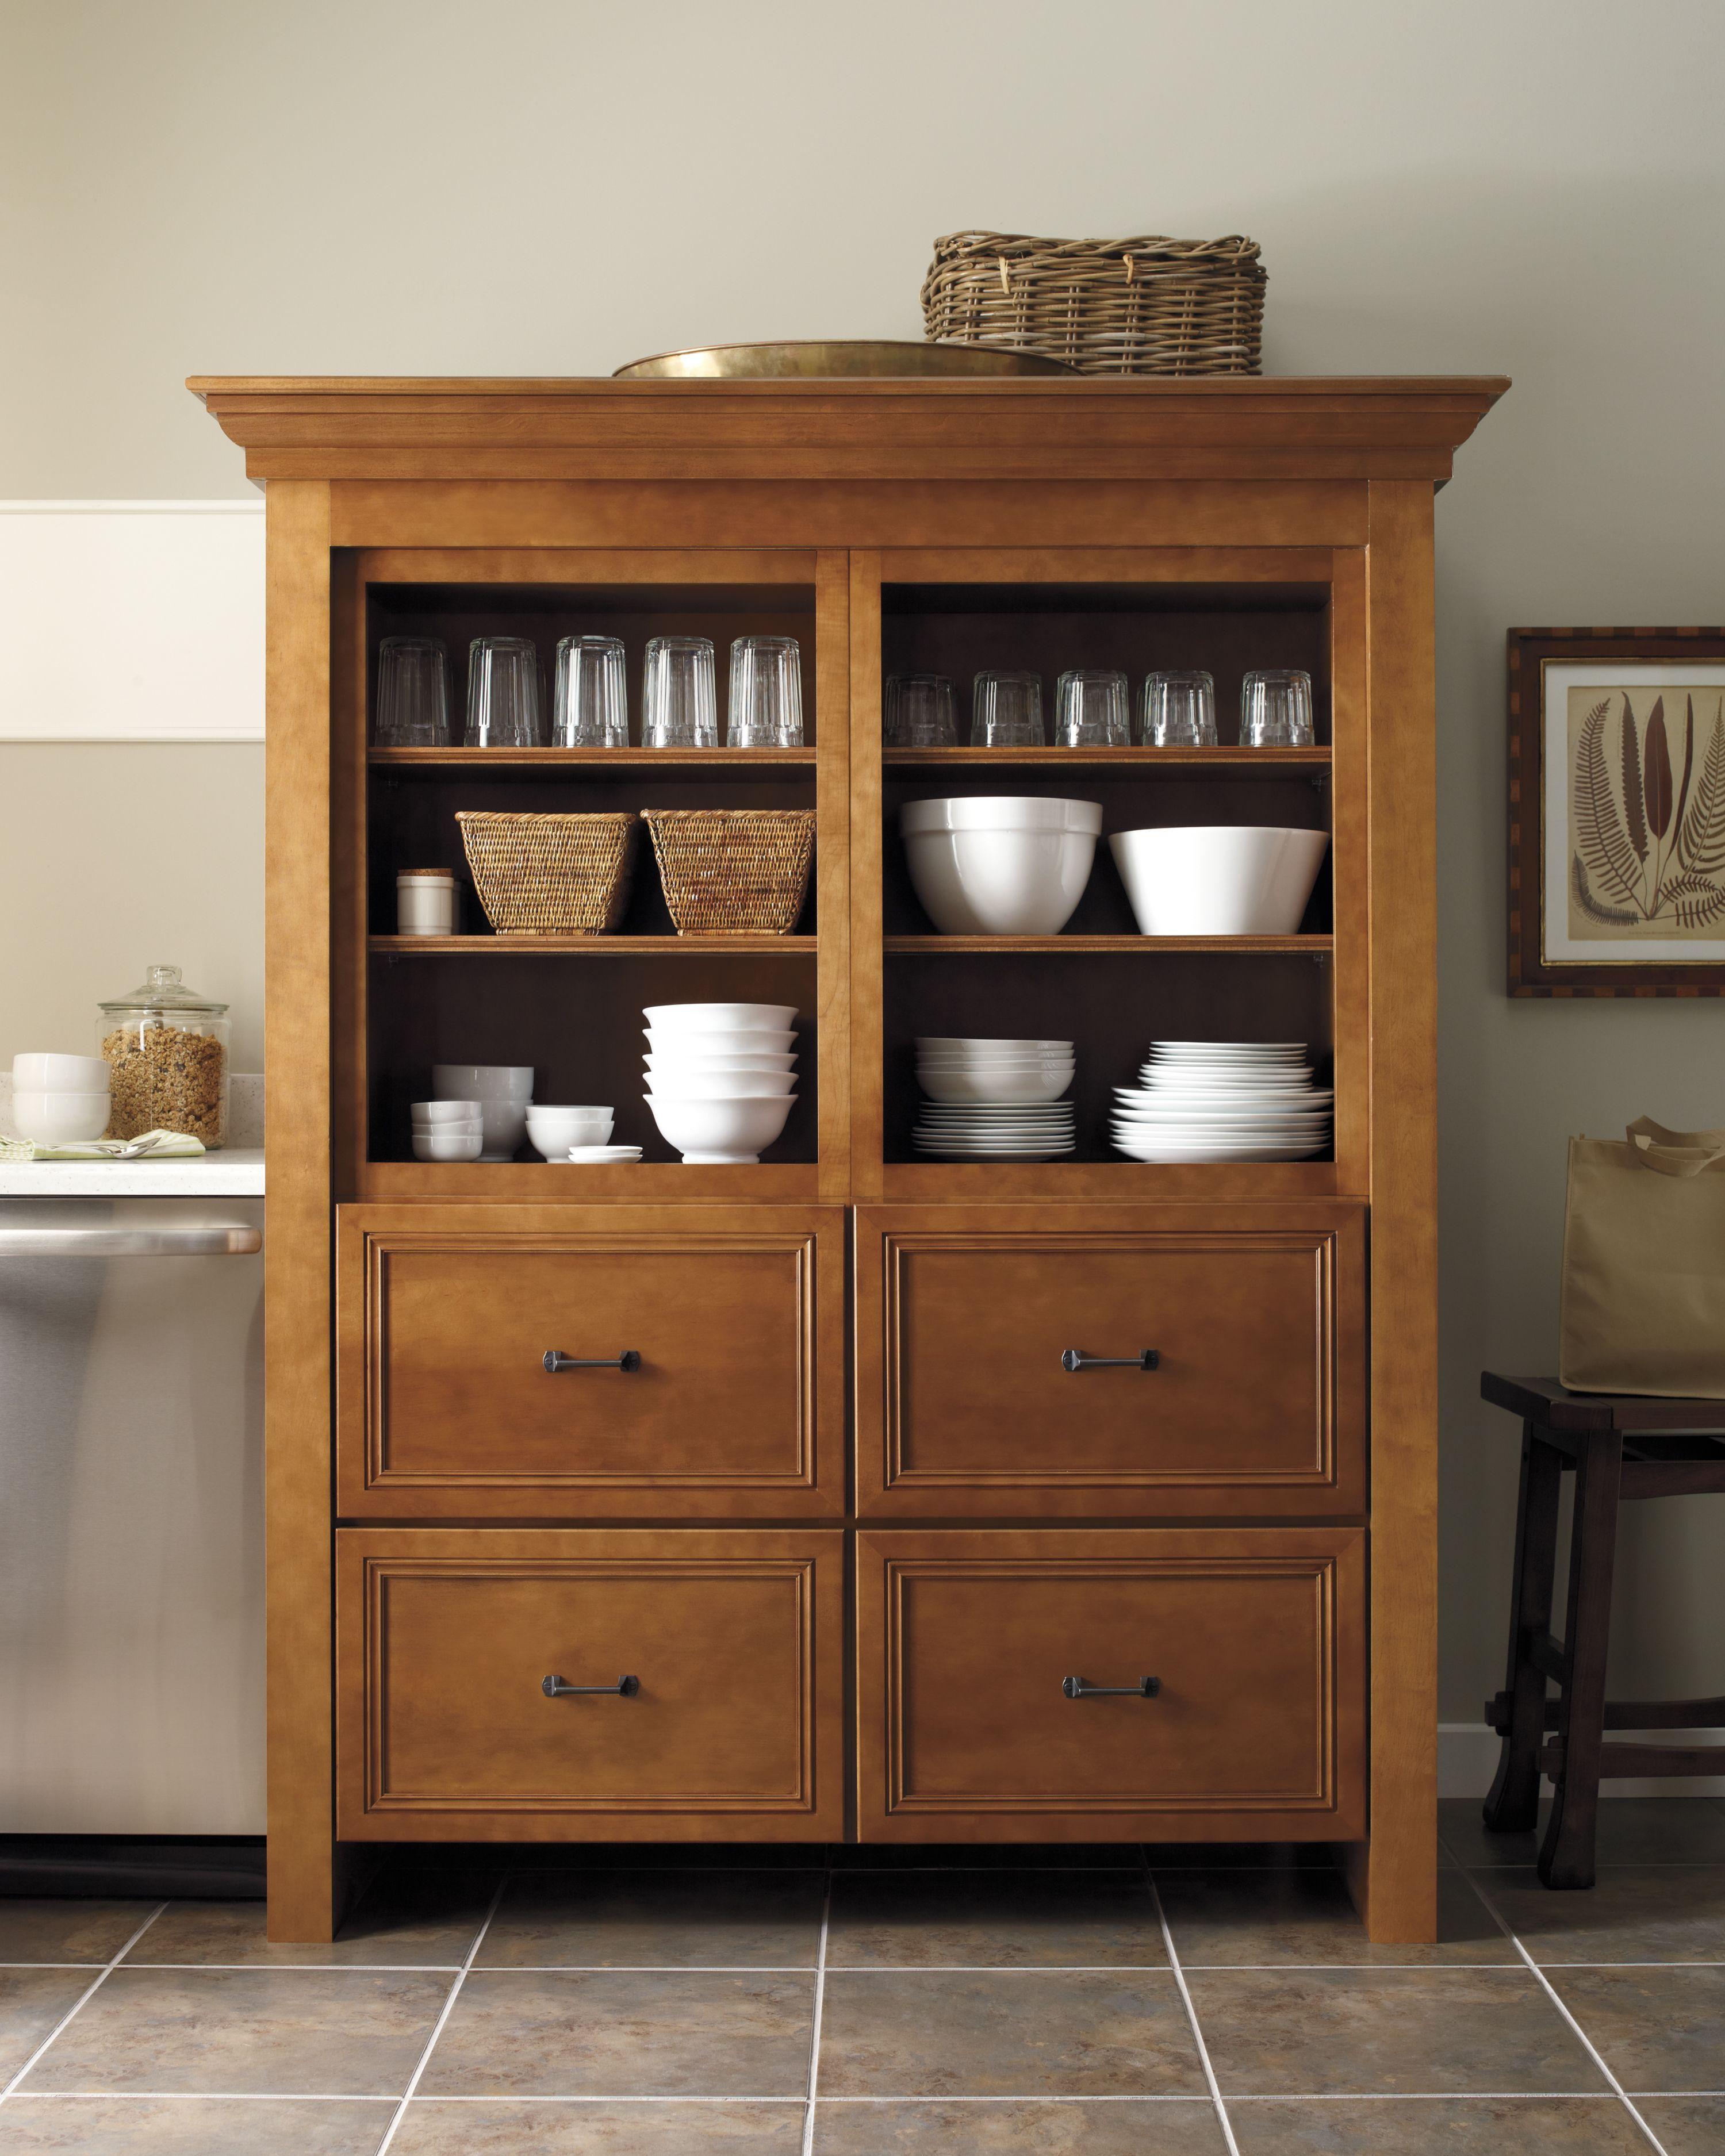 Martha Stewart Living Kitchen Designs From The Home Depot In 2020 Freestanding Kitchen Home Depot Kitchen Martha Stewart Living Kitchen